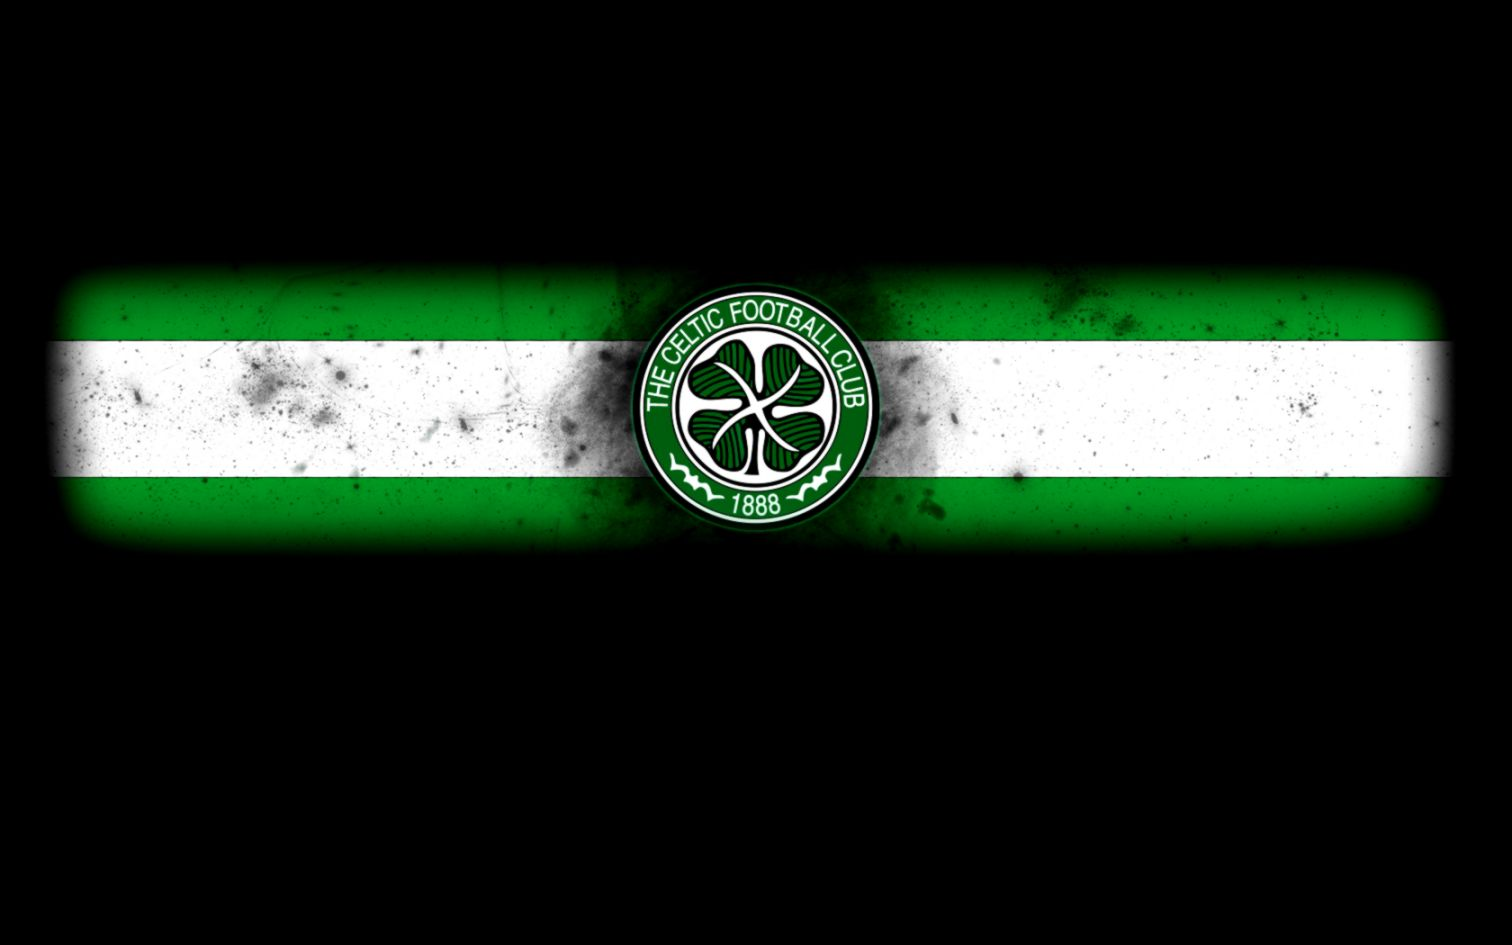 Juventus Celtic Football Club Wallpaper